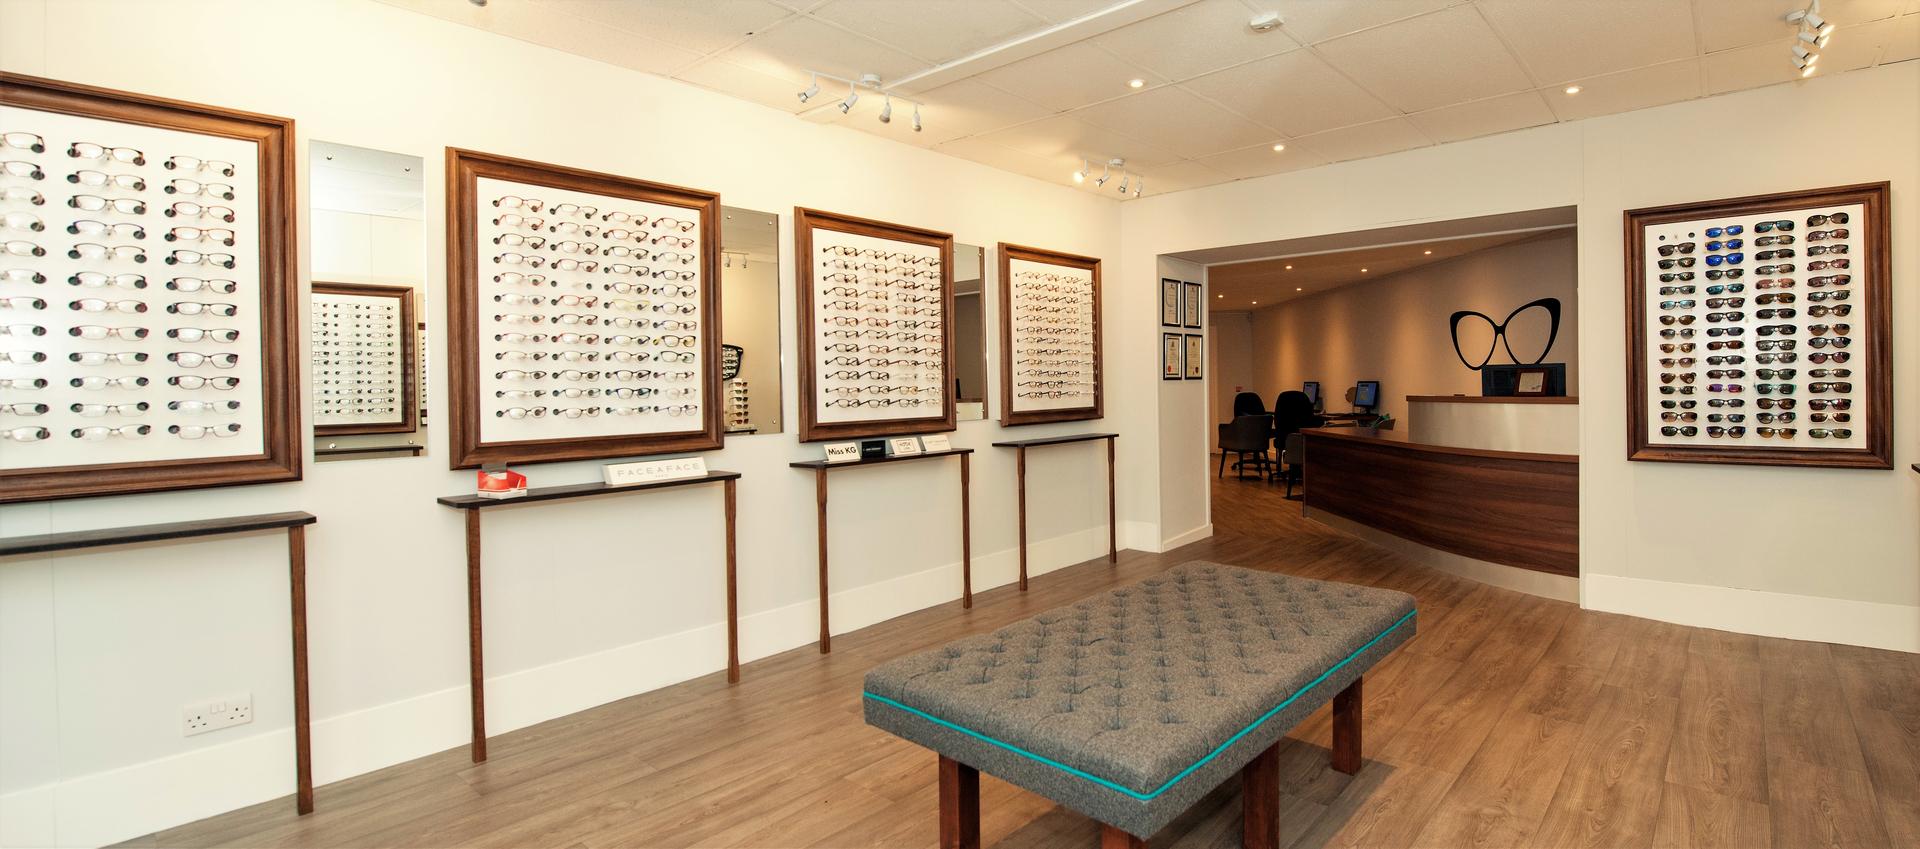 76fbb648406 Dunne   Drennan Eyecare - Eye Tests